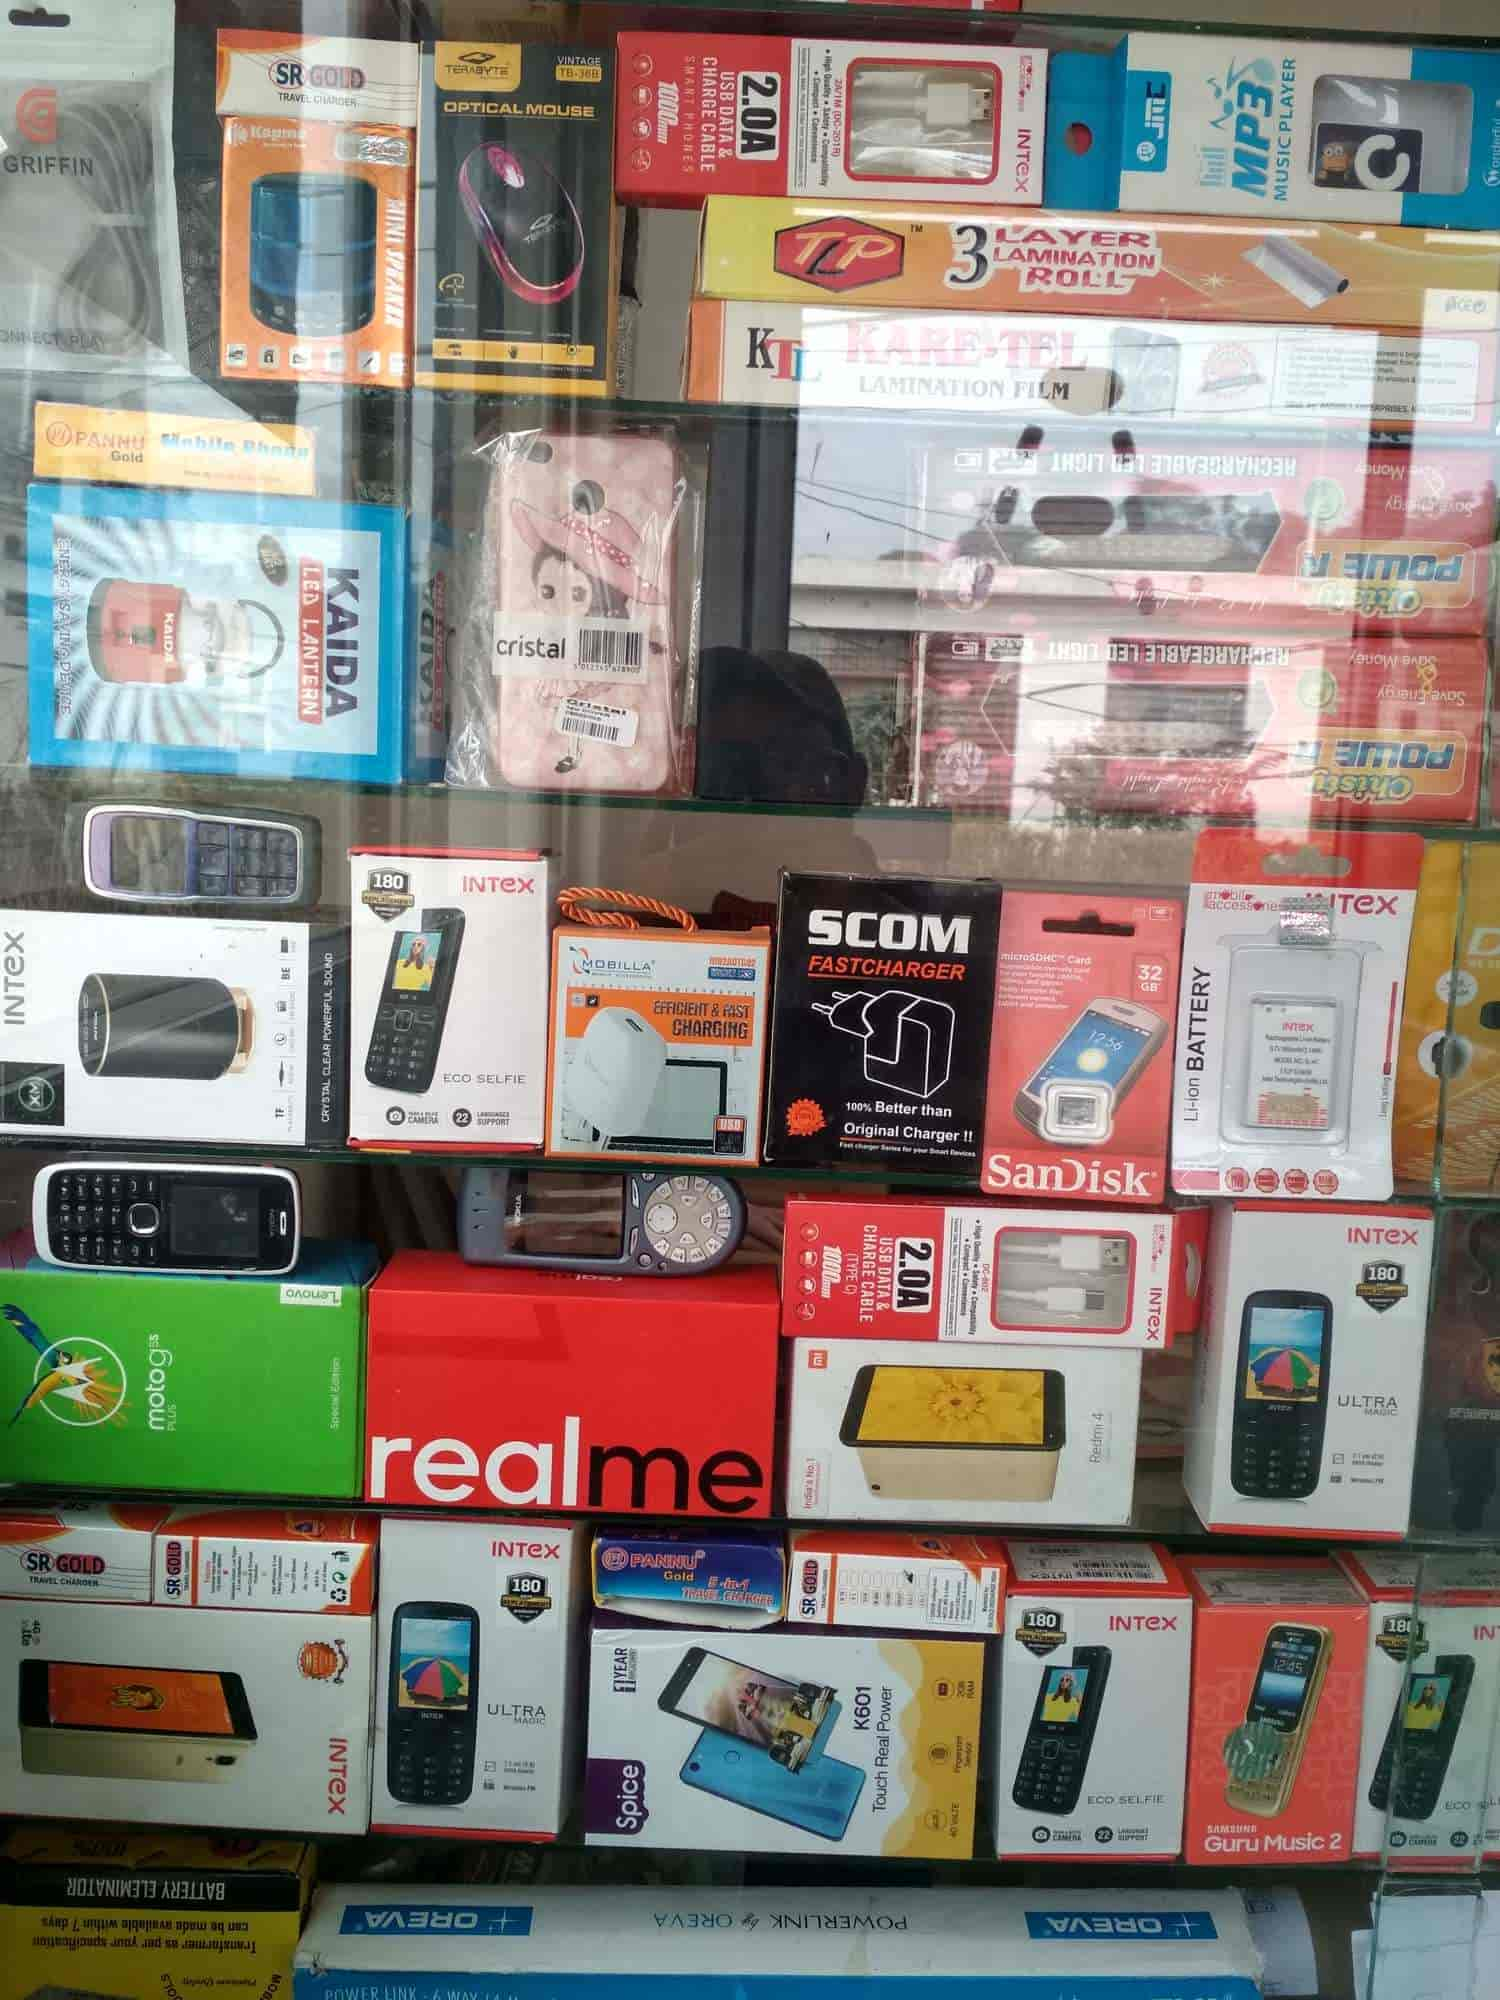 thakur communication naya gaon mobile phone repair services in rh justdial com